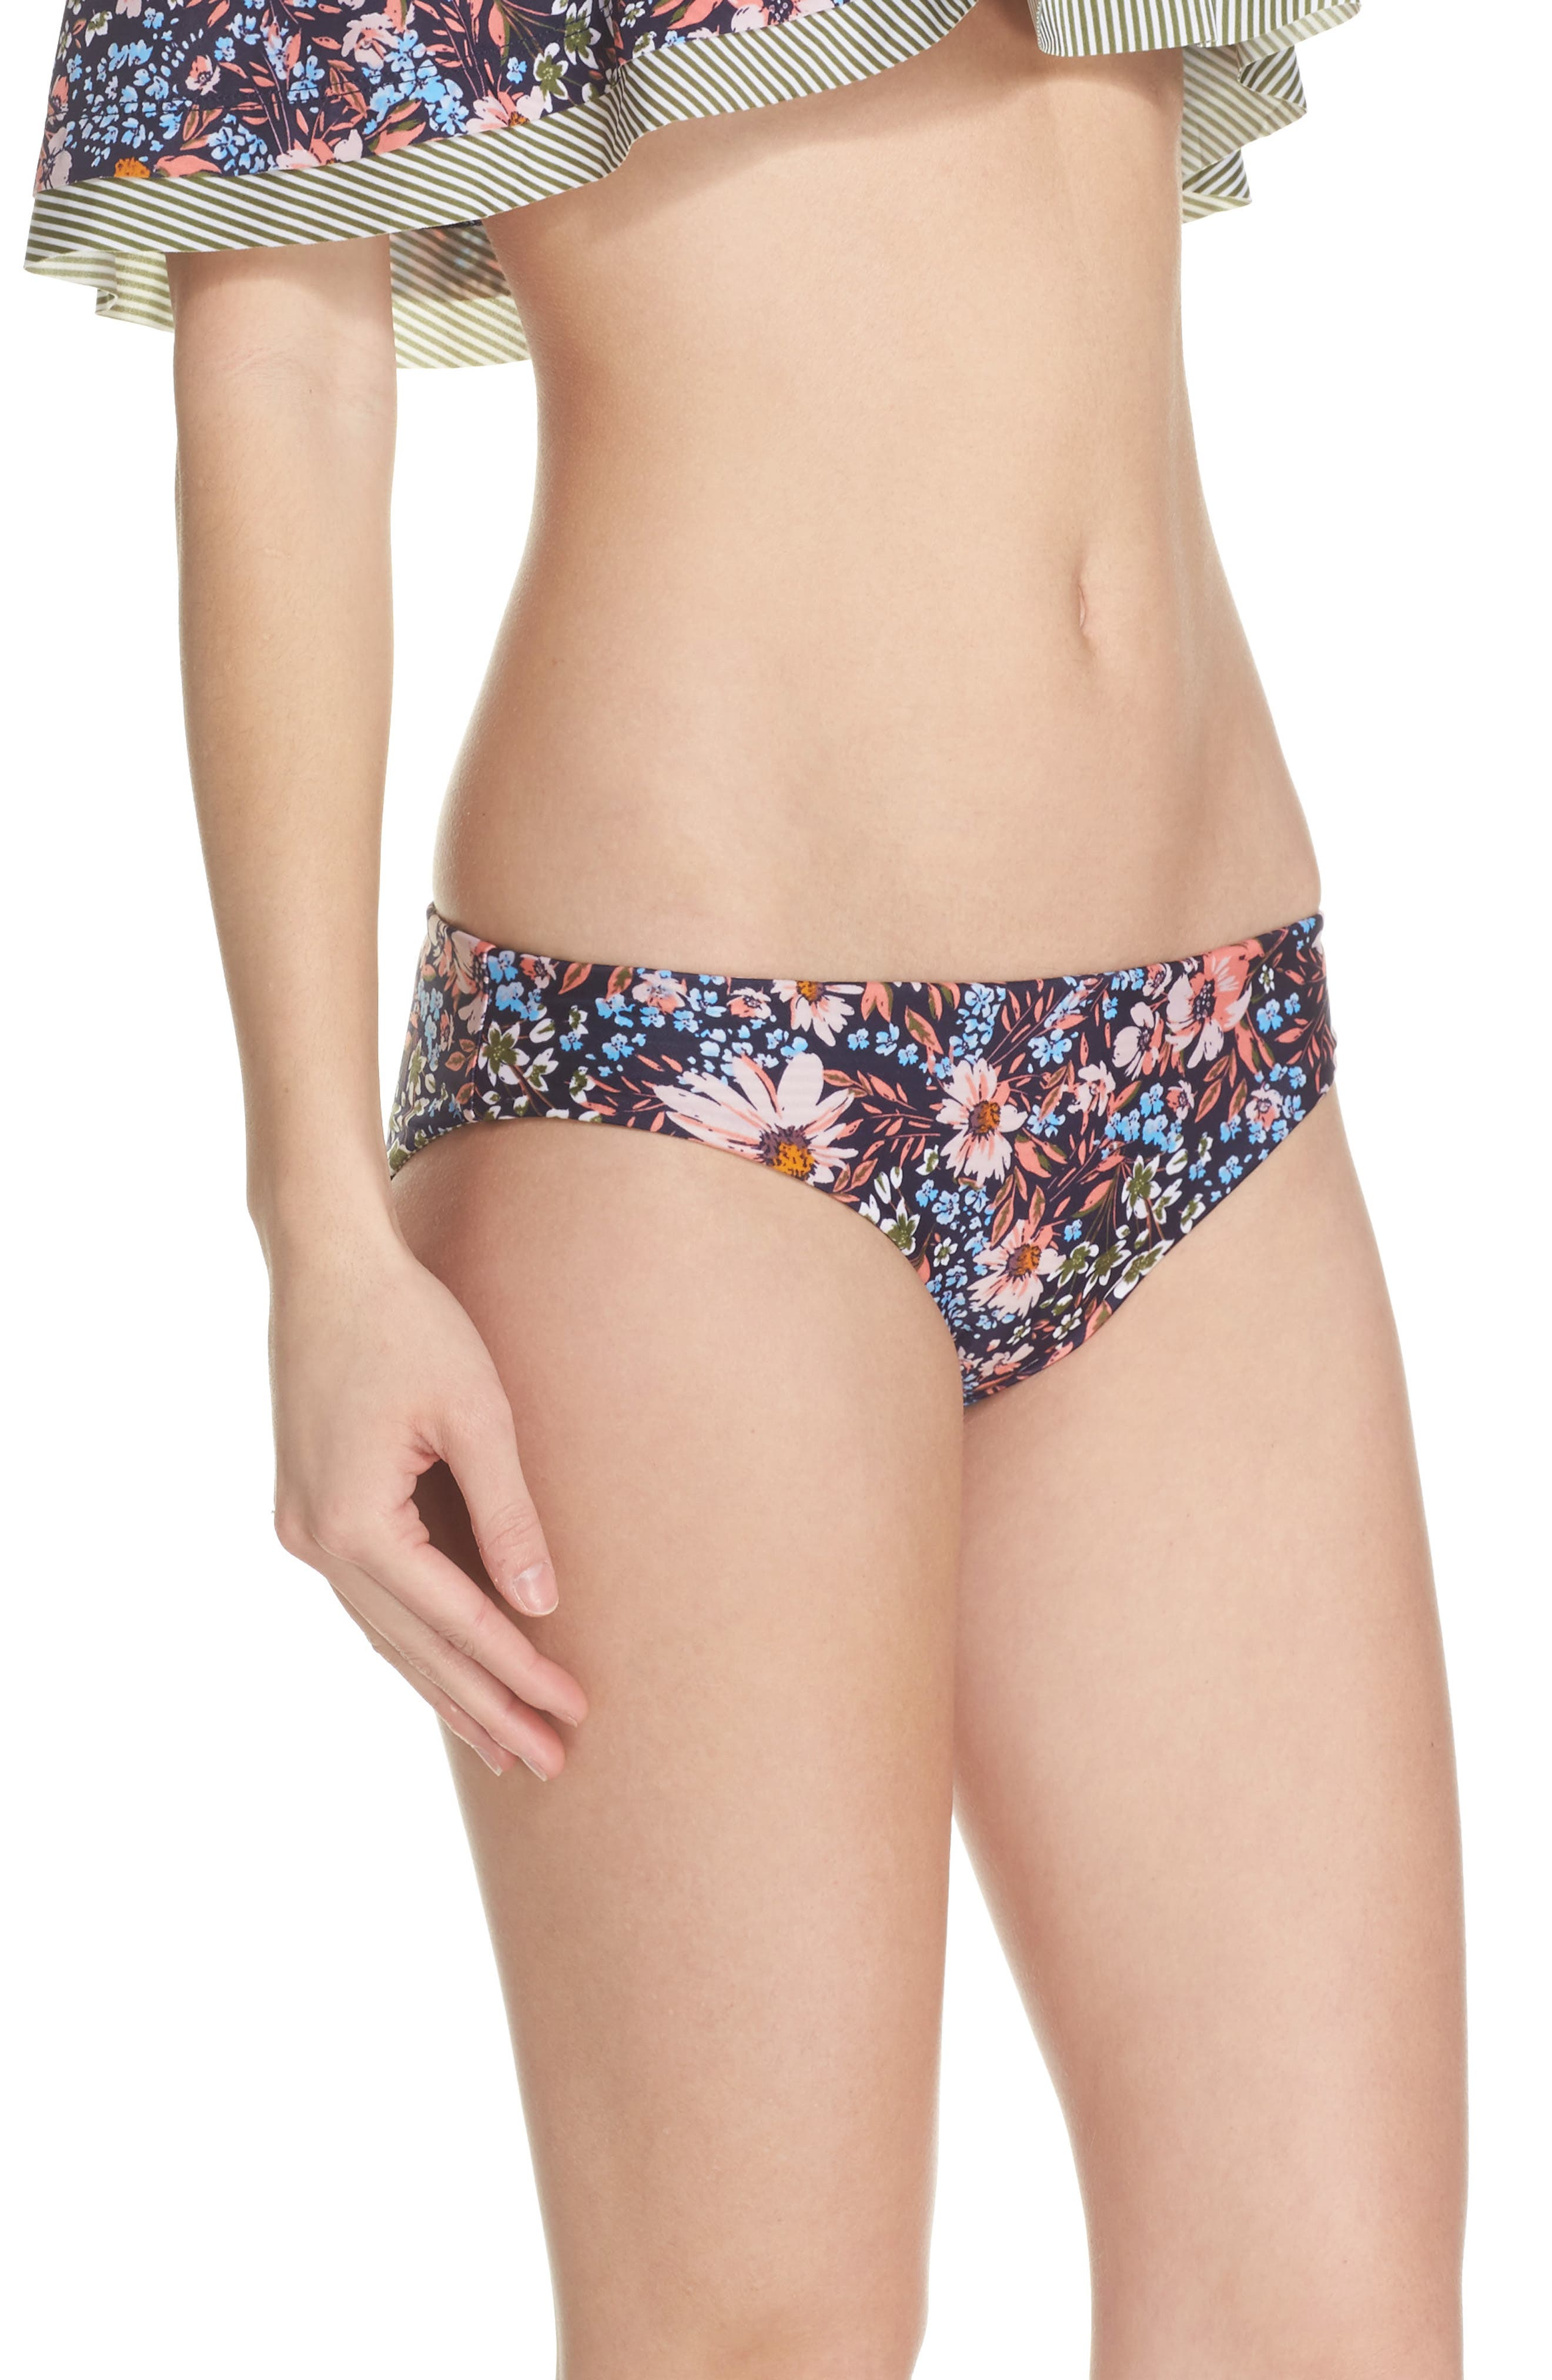 Enchanted Reversible Bikini Bottoms,                             Alternate thumbnail 4, color,